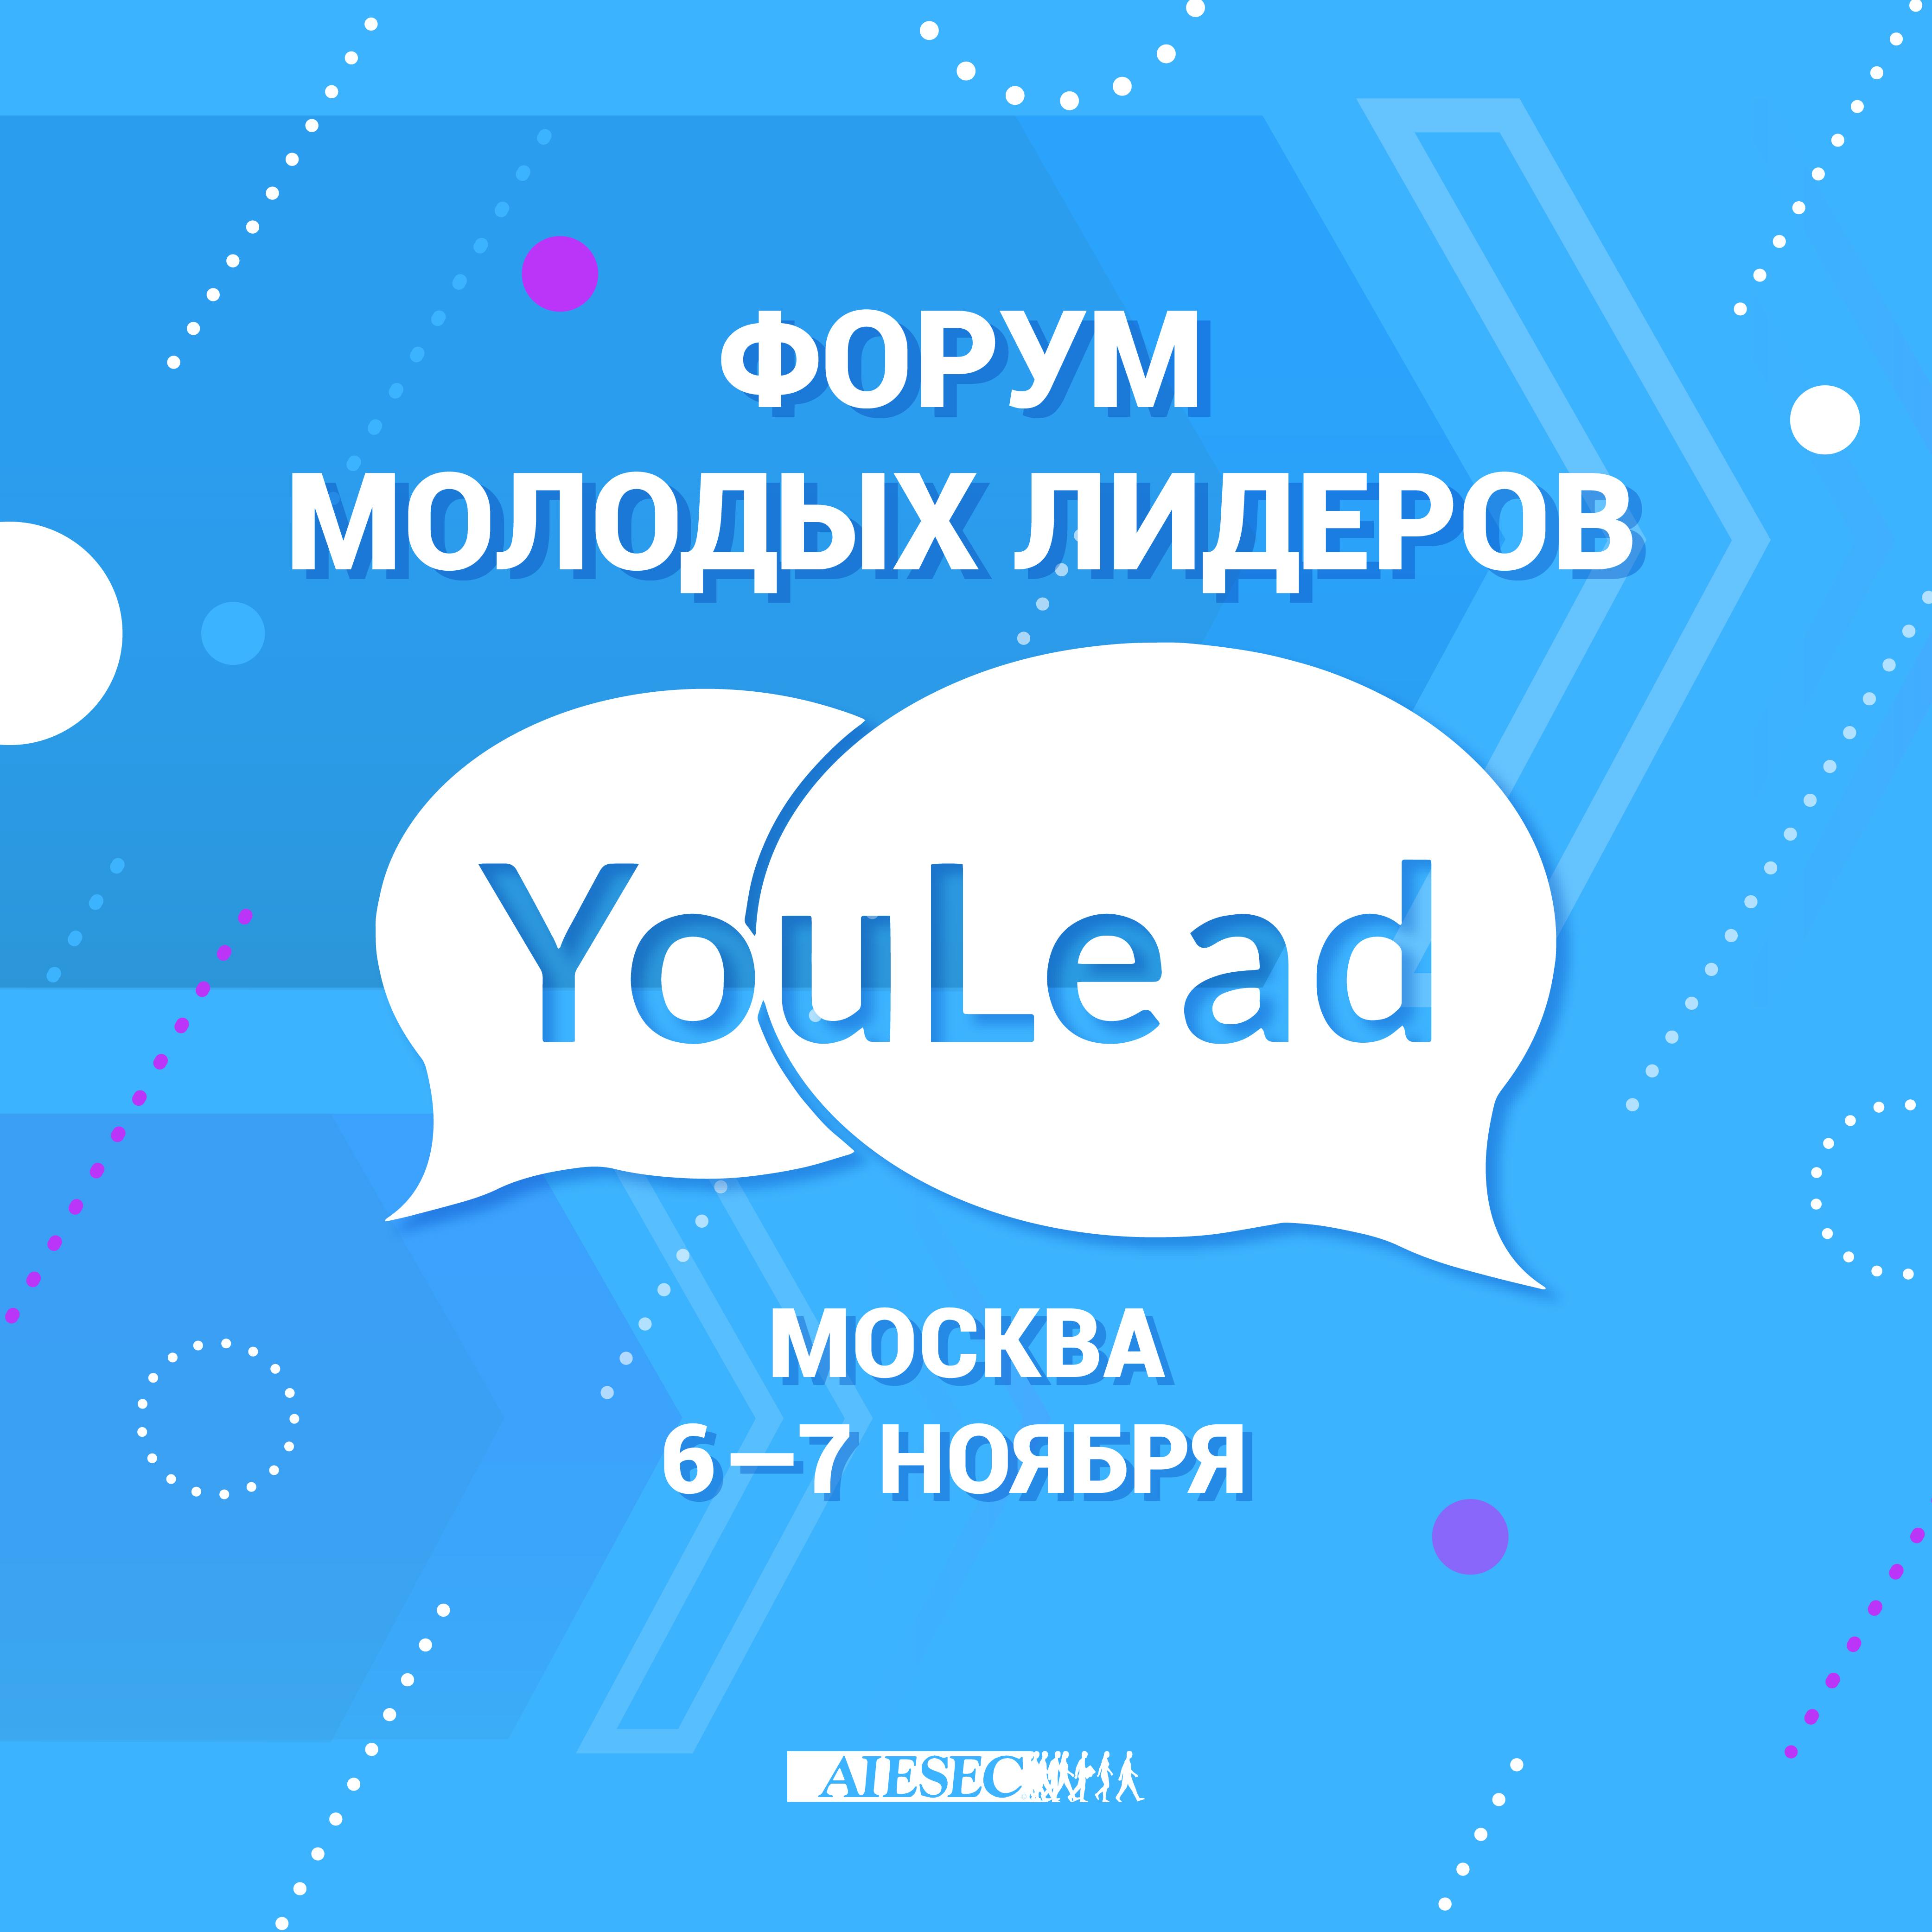 Форум YouLead-2019 в Москве